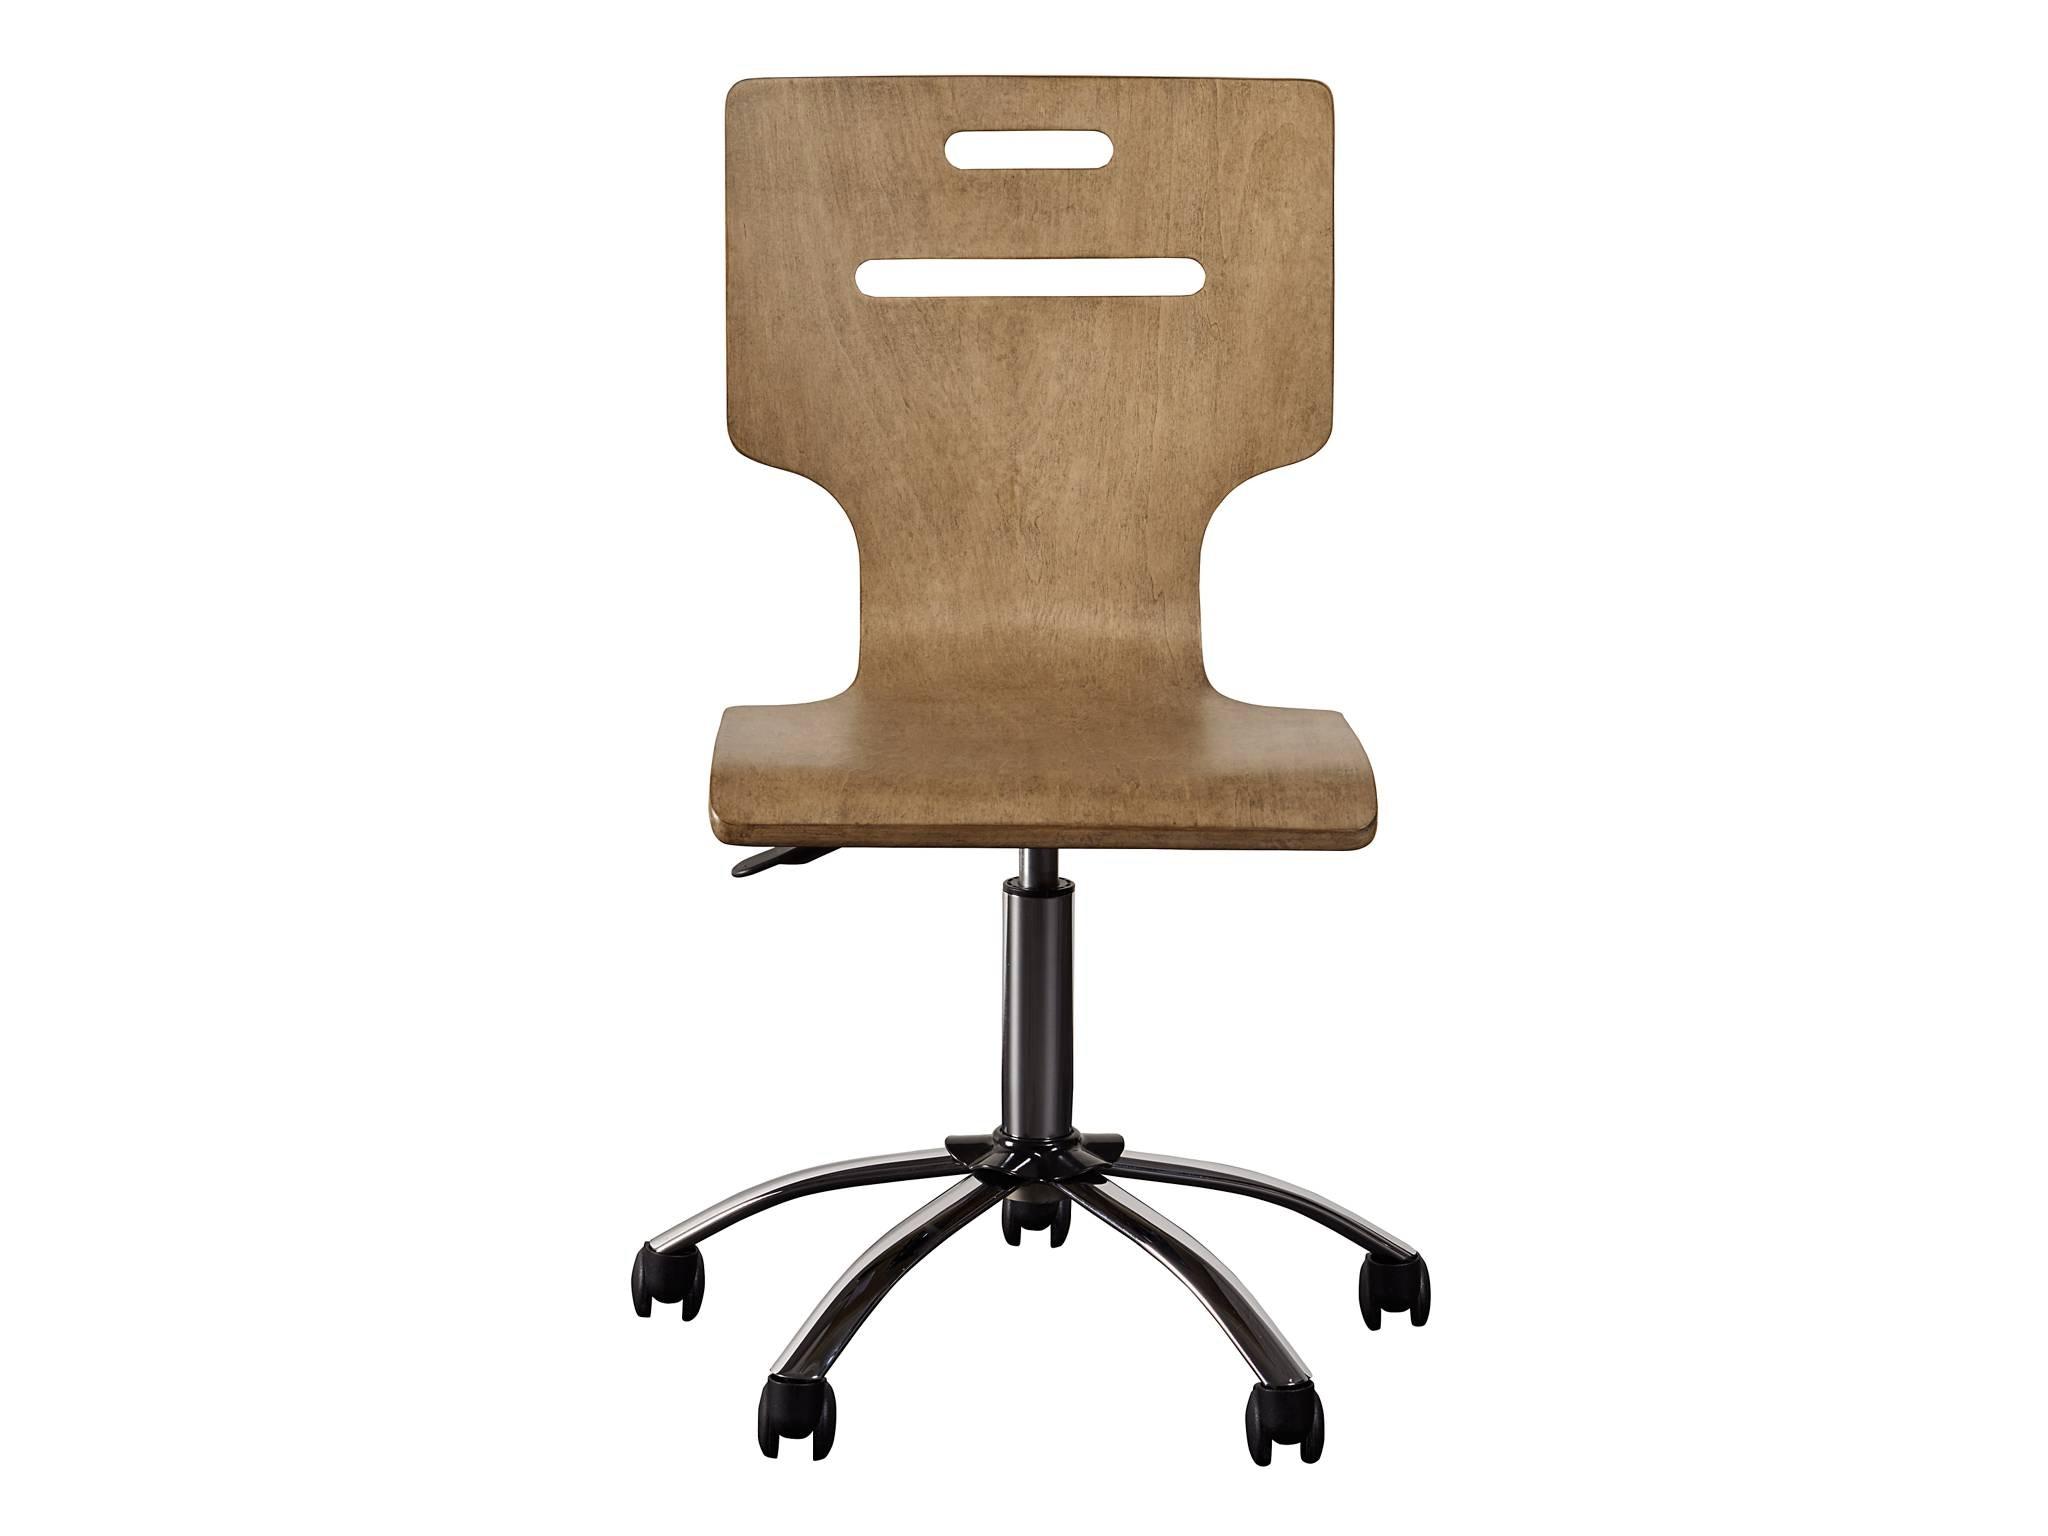 Stone u0026 Leigh Youth Desk Chair 584-63-71 - Henredon u0026 Schoener - Bellevue, WA Call for more ...